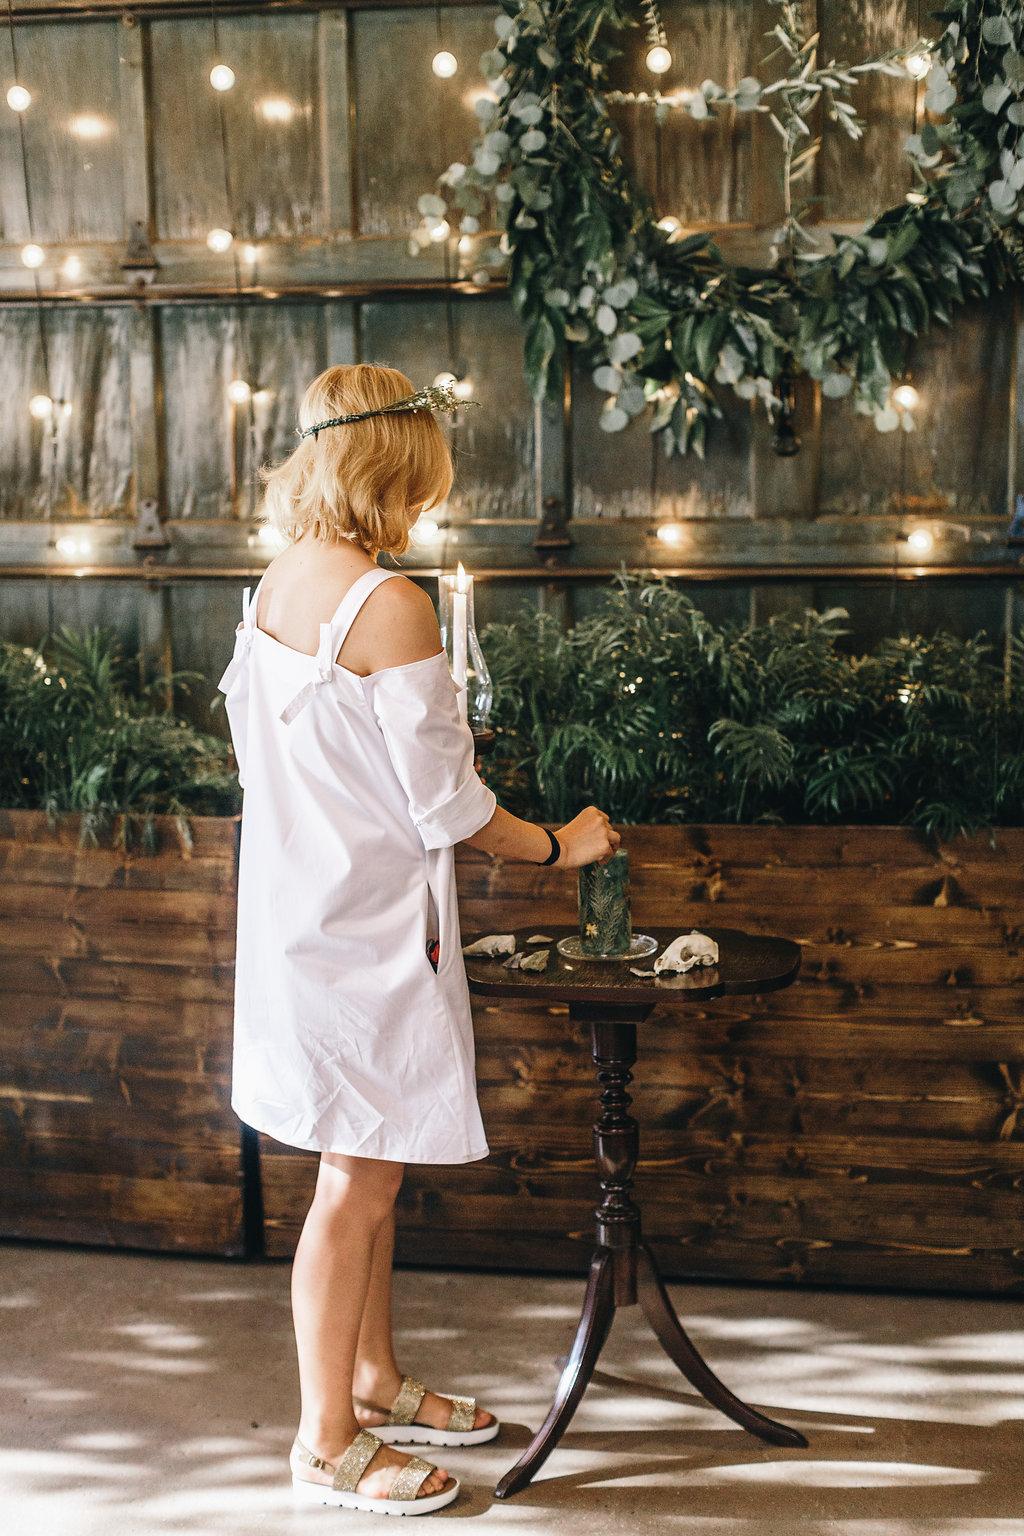 shannon-britt-mackensey-alexander-photography-green-wedding-shoes-ivory-and-beau-bridal-boutique-savannah-wedding-planner-savannah-bridal-boutique-savannah-wedding-dresses-savannah-florist-summer-solstice-wedding-boho-soho-south-cafe-wedding-48.jpg